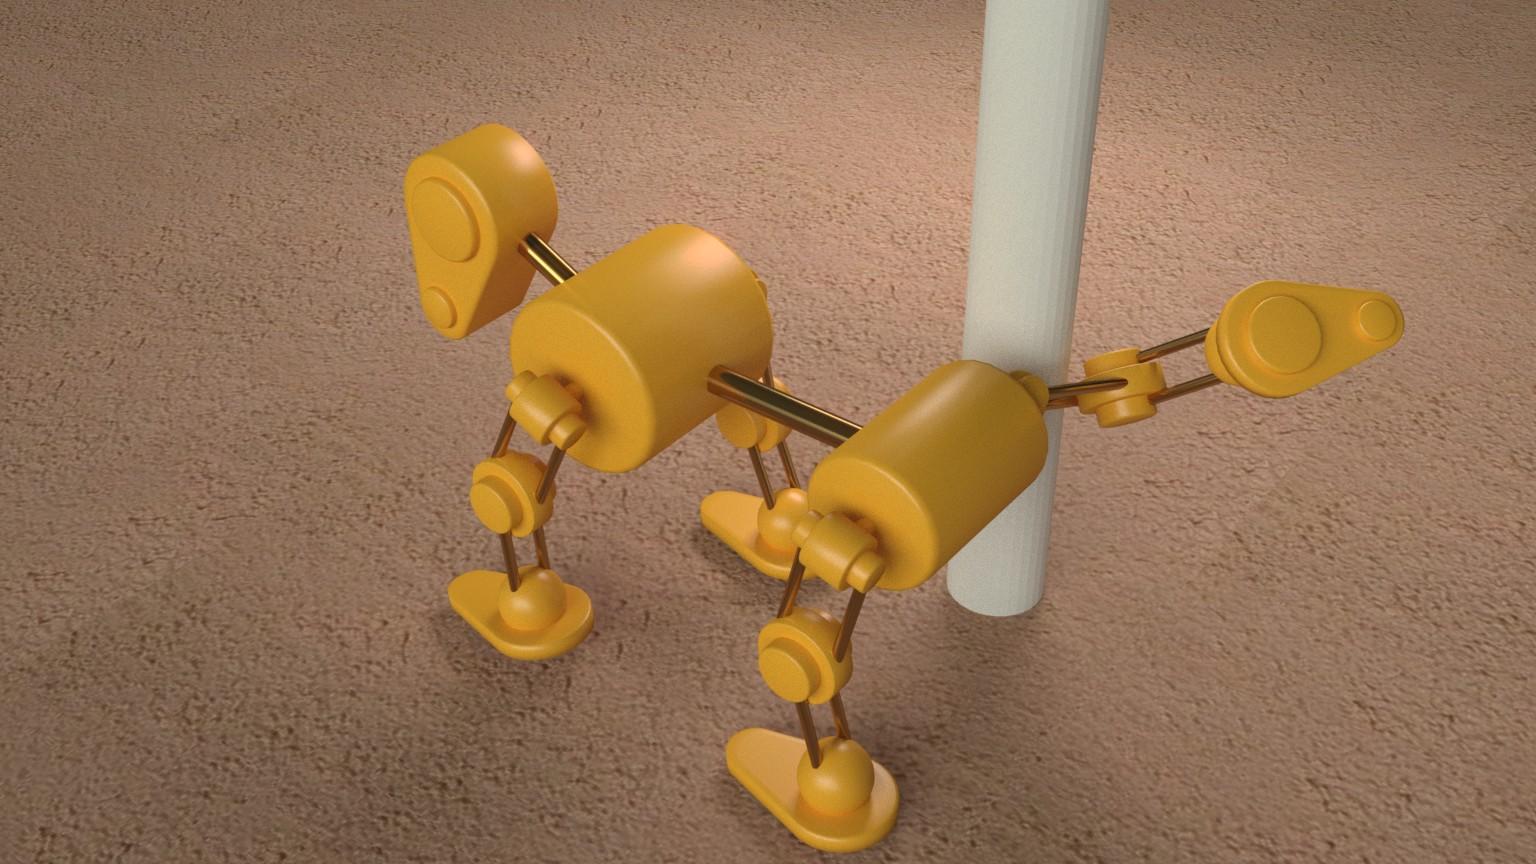 Robot_perro-robot_perro2.jpg